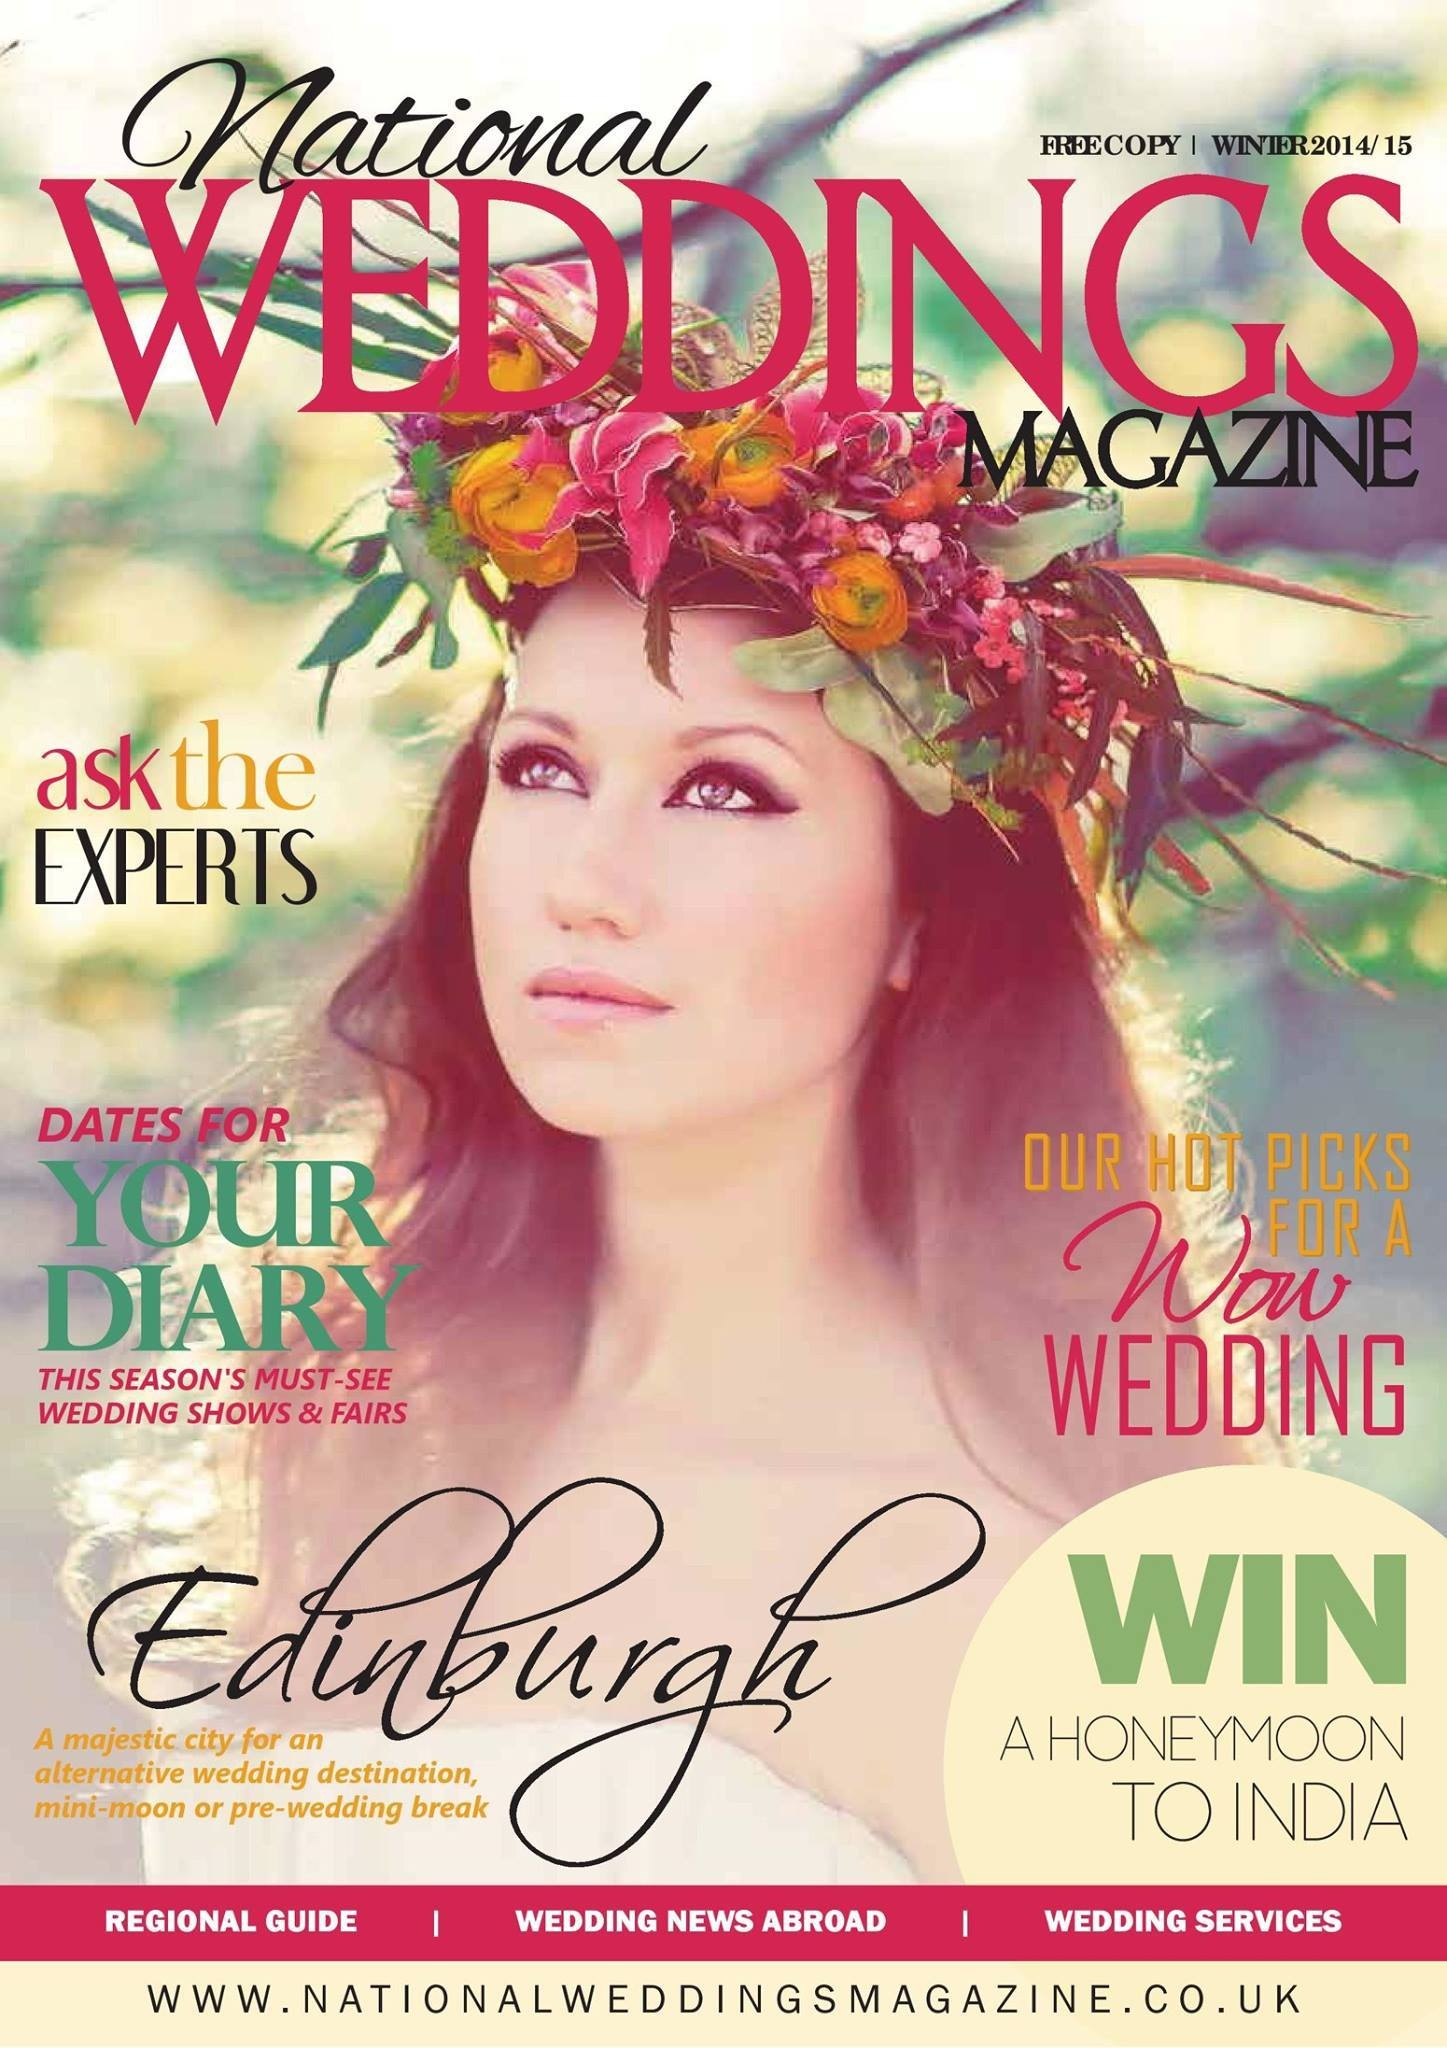 national weddings magazine cover charlotte munro.JPG